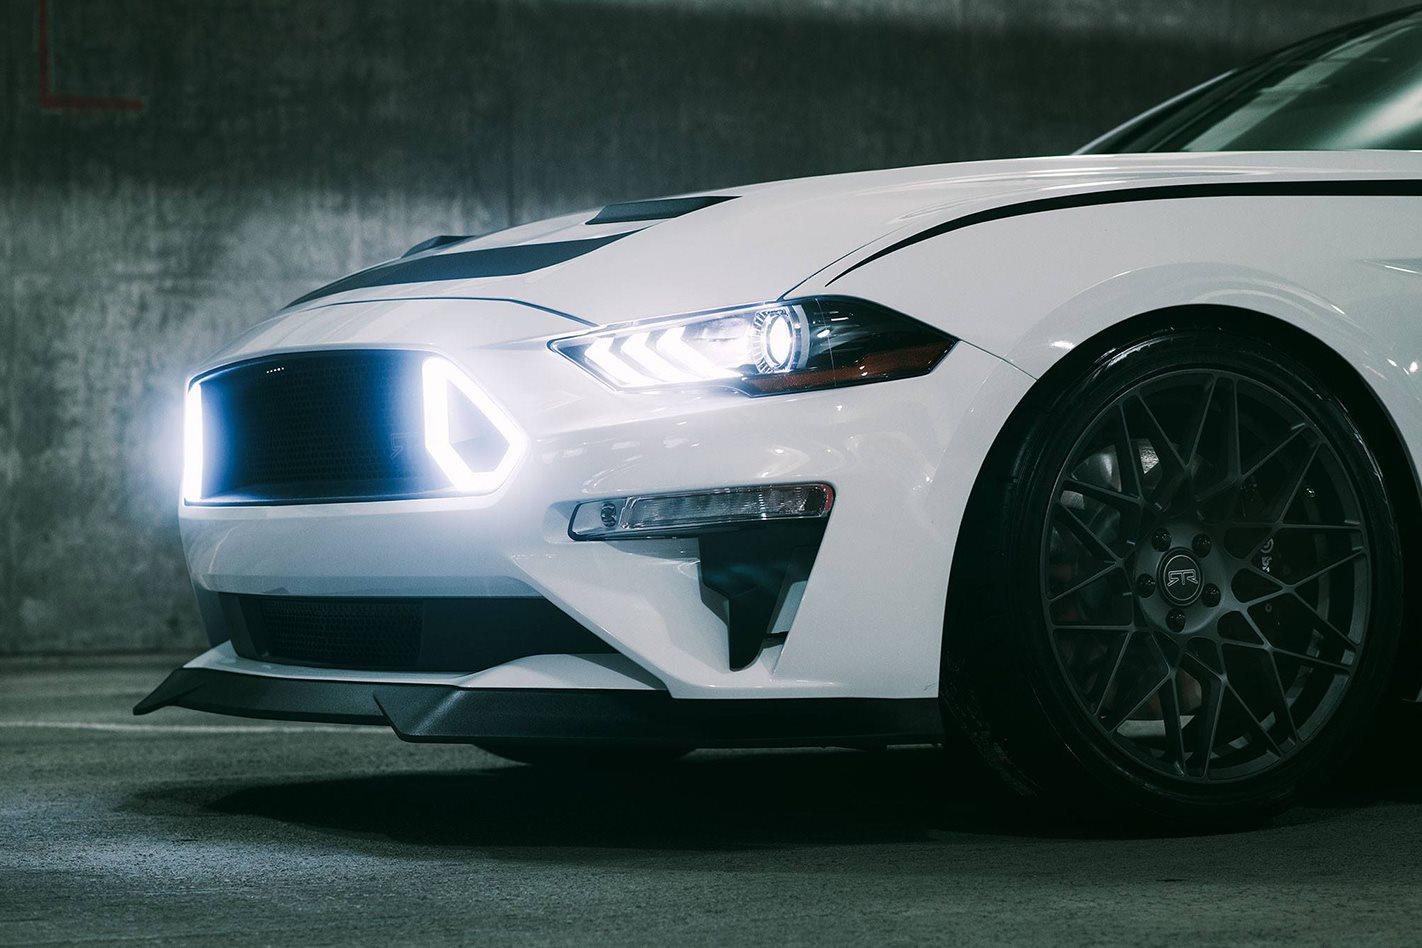 2018--Ford-Mustang-RTR-headlights.jpg